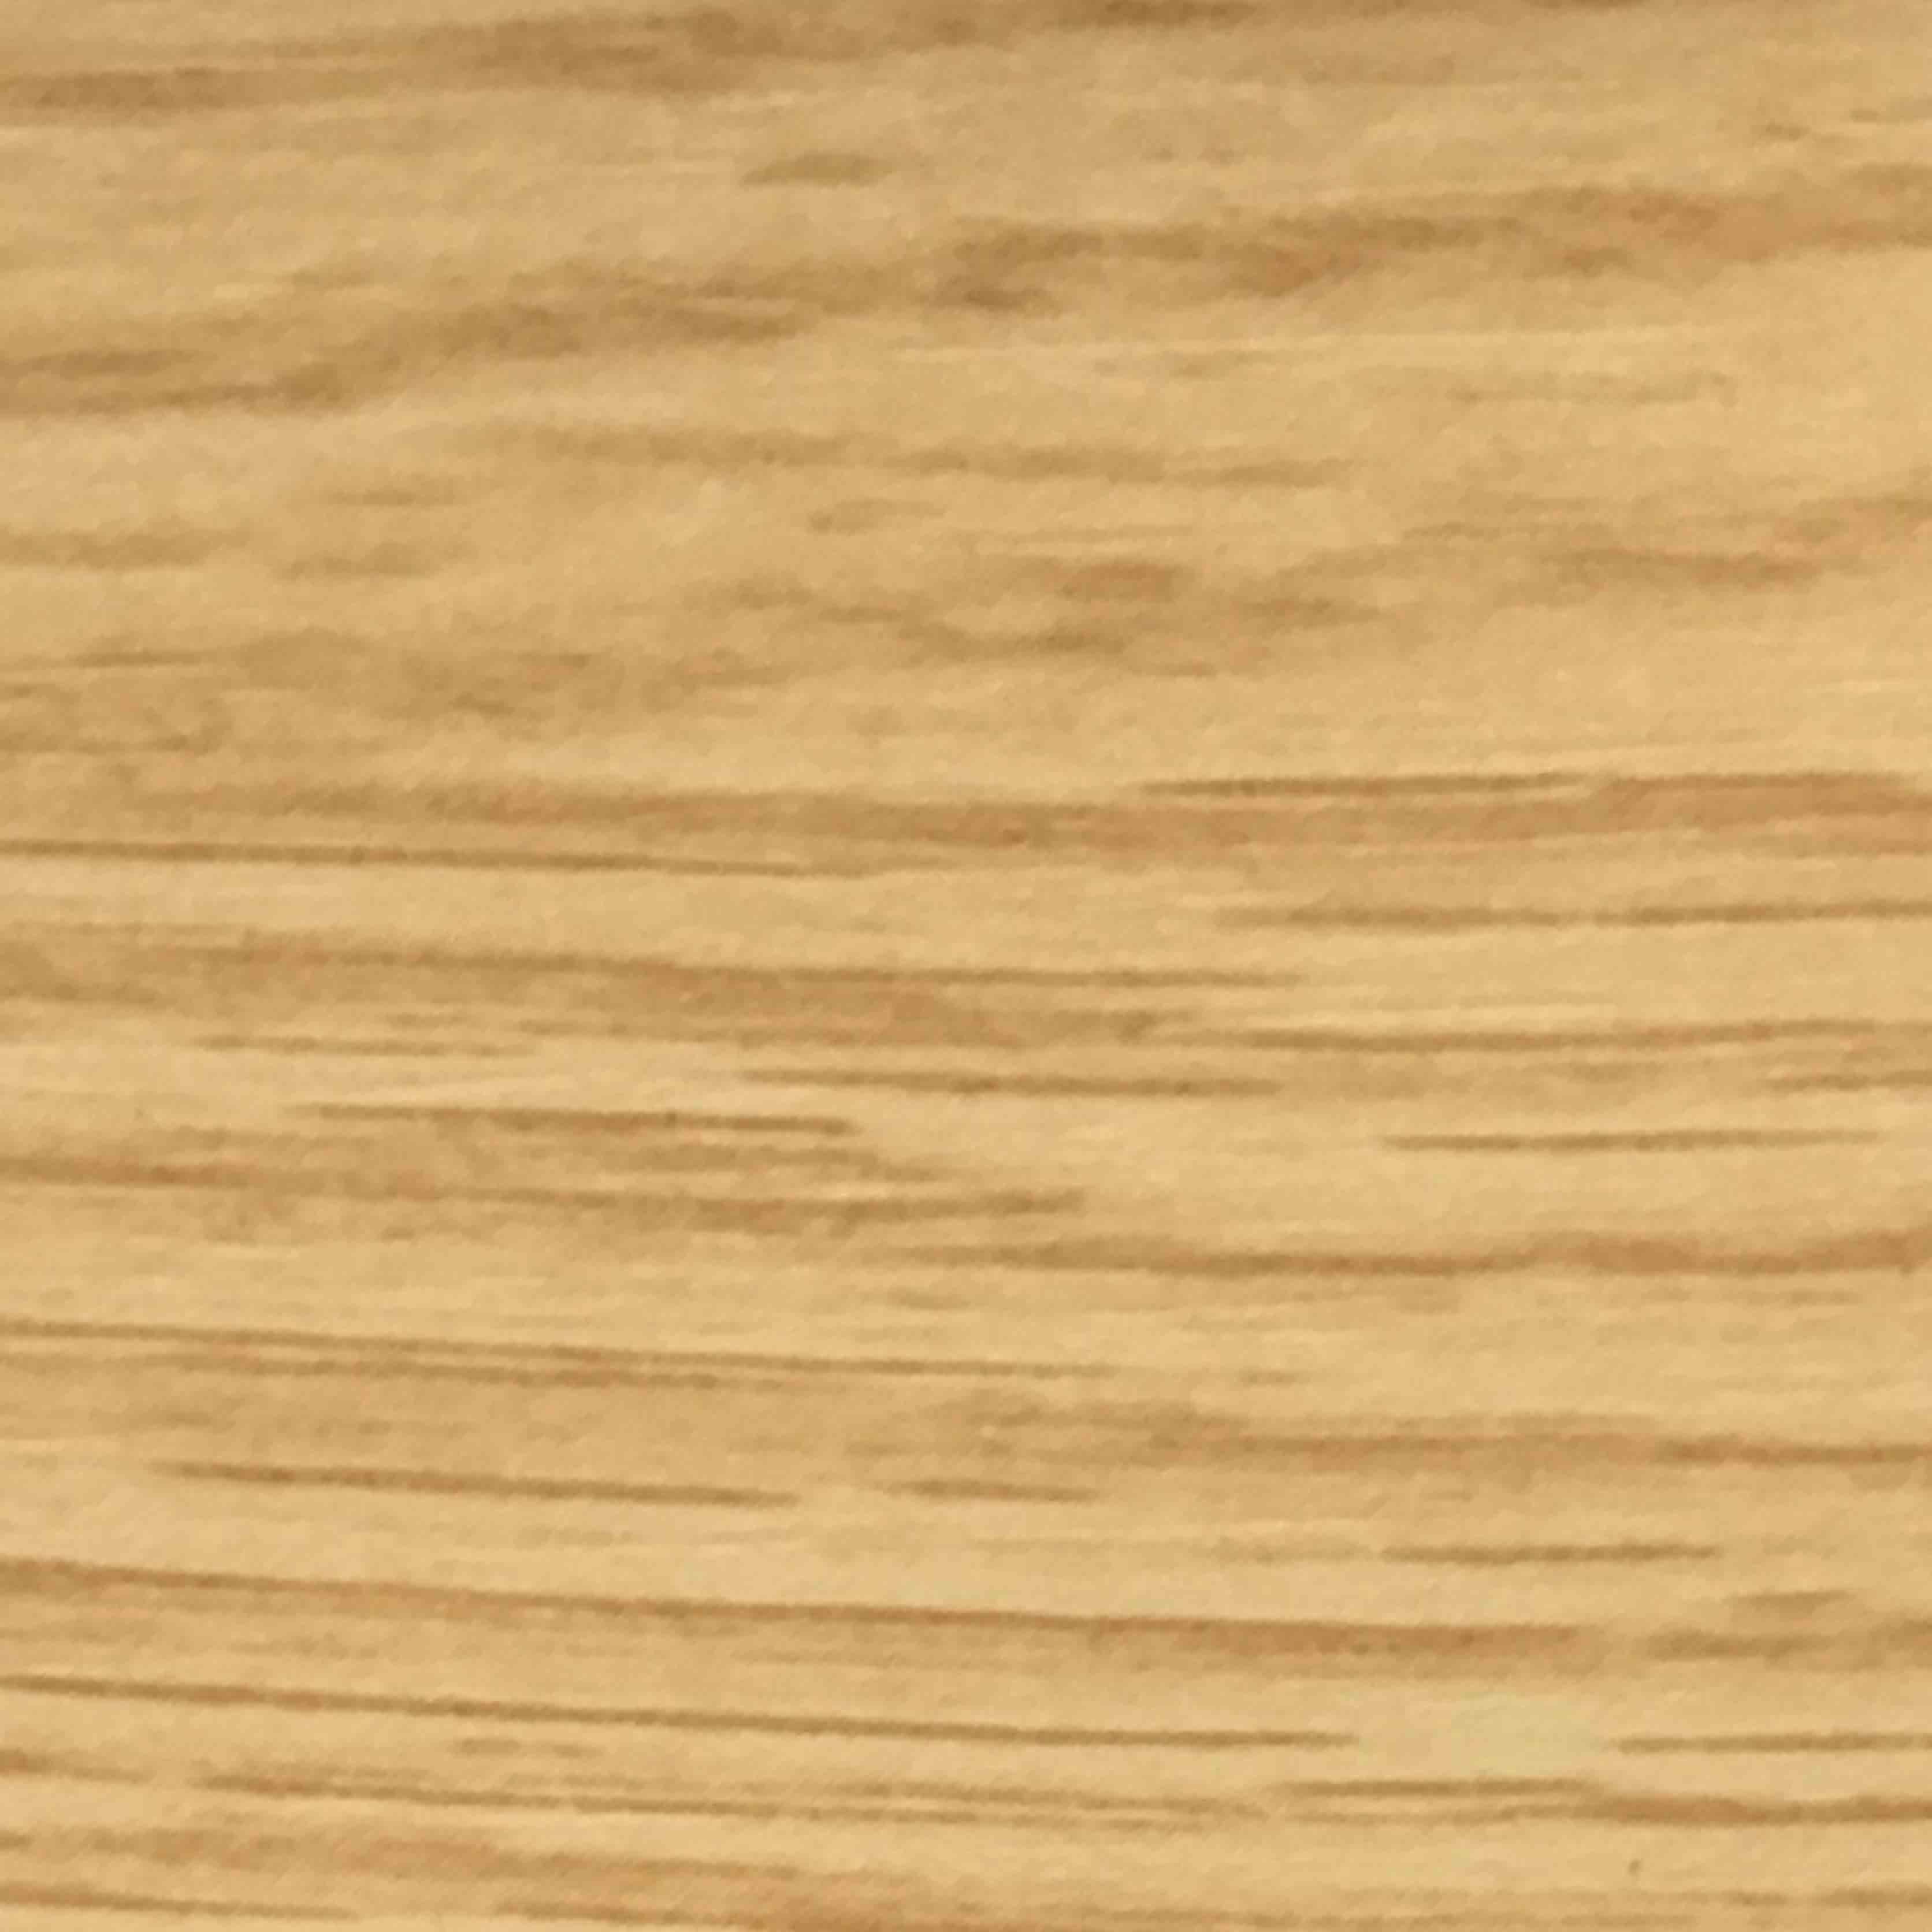 Decal vân gỗ - H143-23